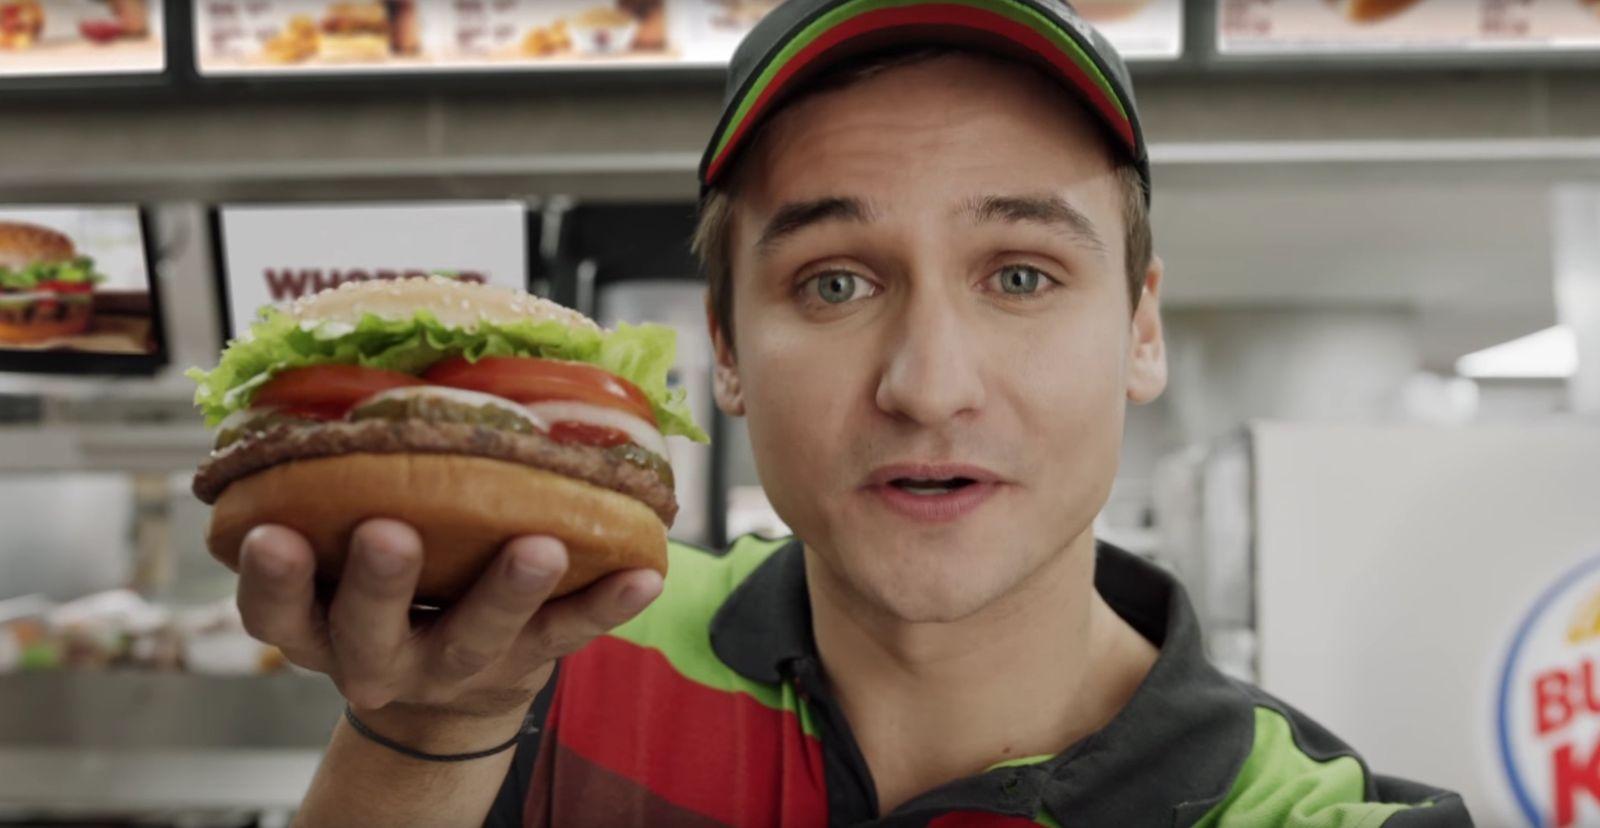 NUR ALS ZITAT Screenshot Burger King